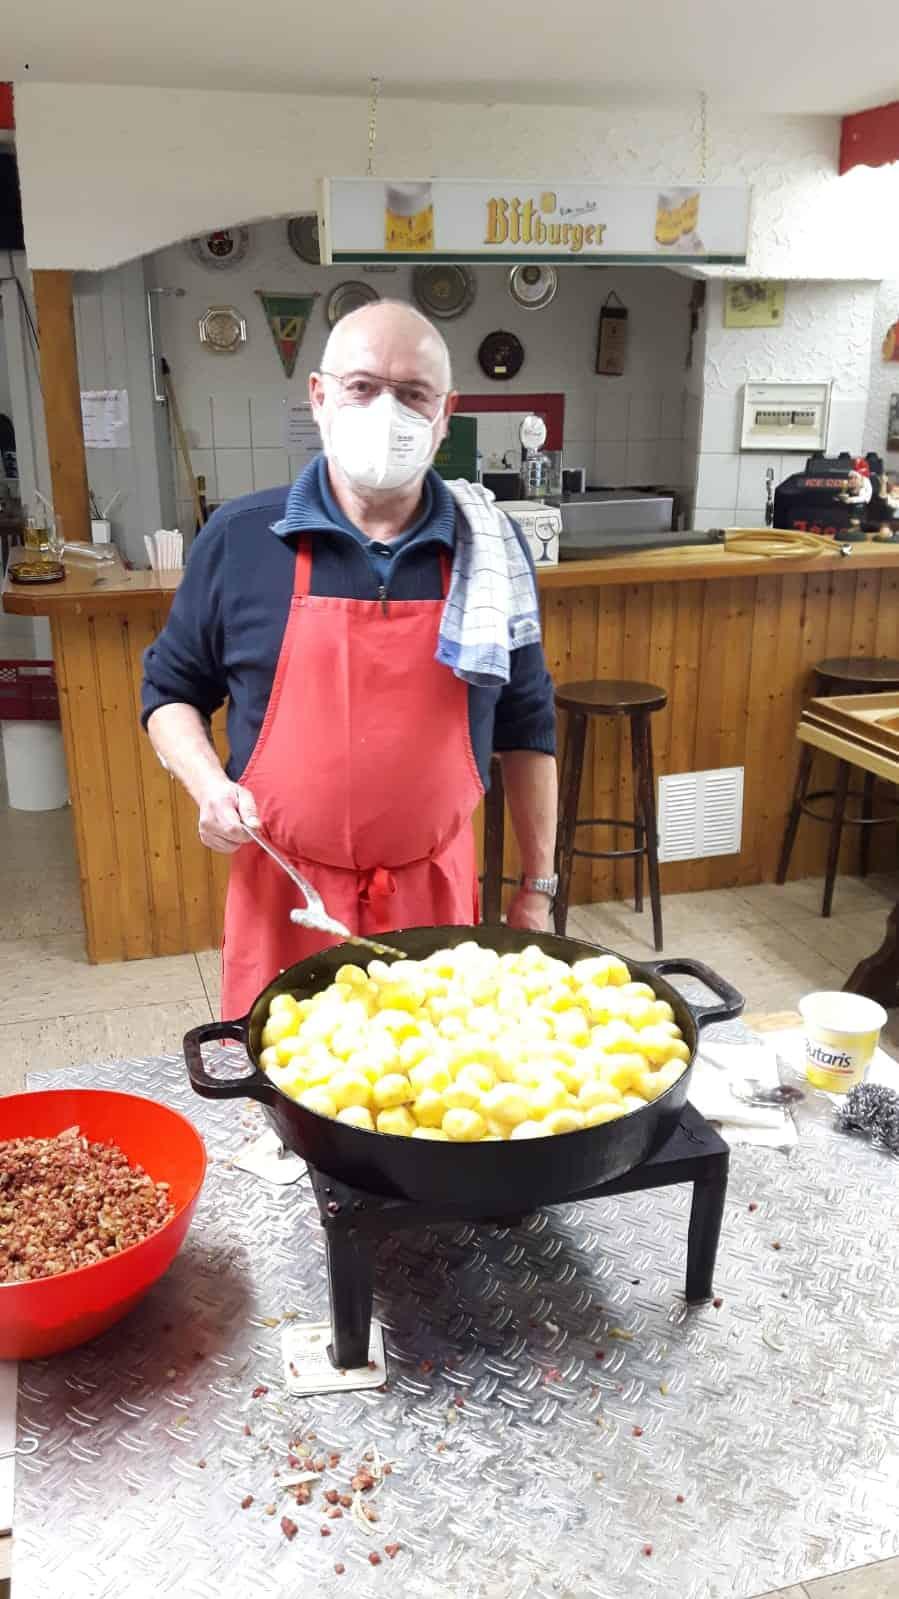 Kochen, Heringsessen, Kartoffeln, KVE